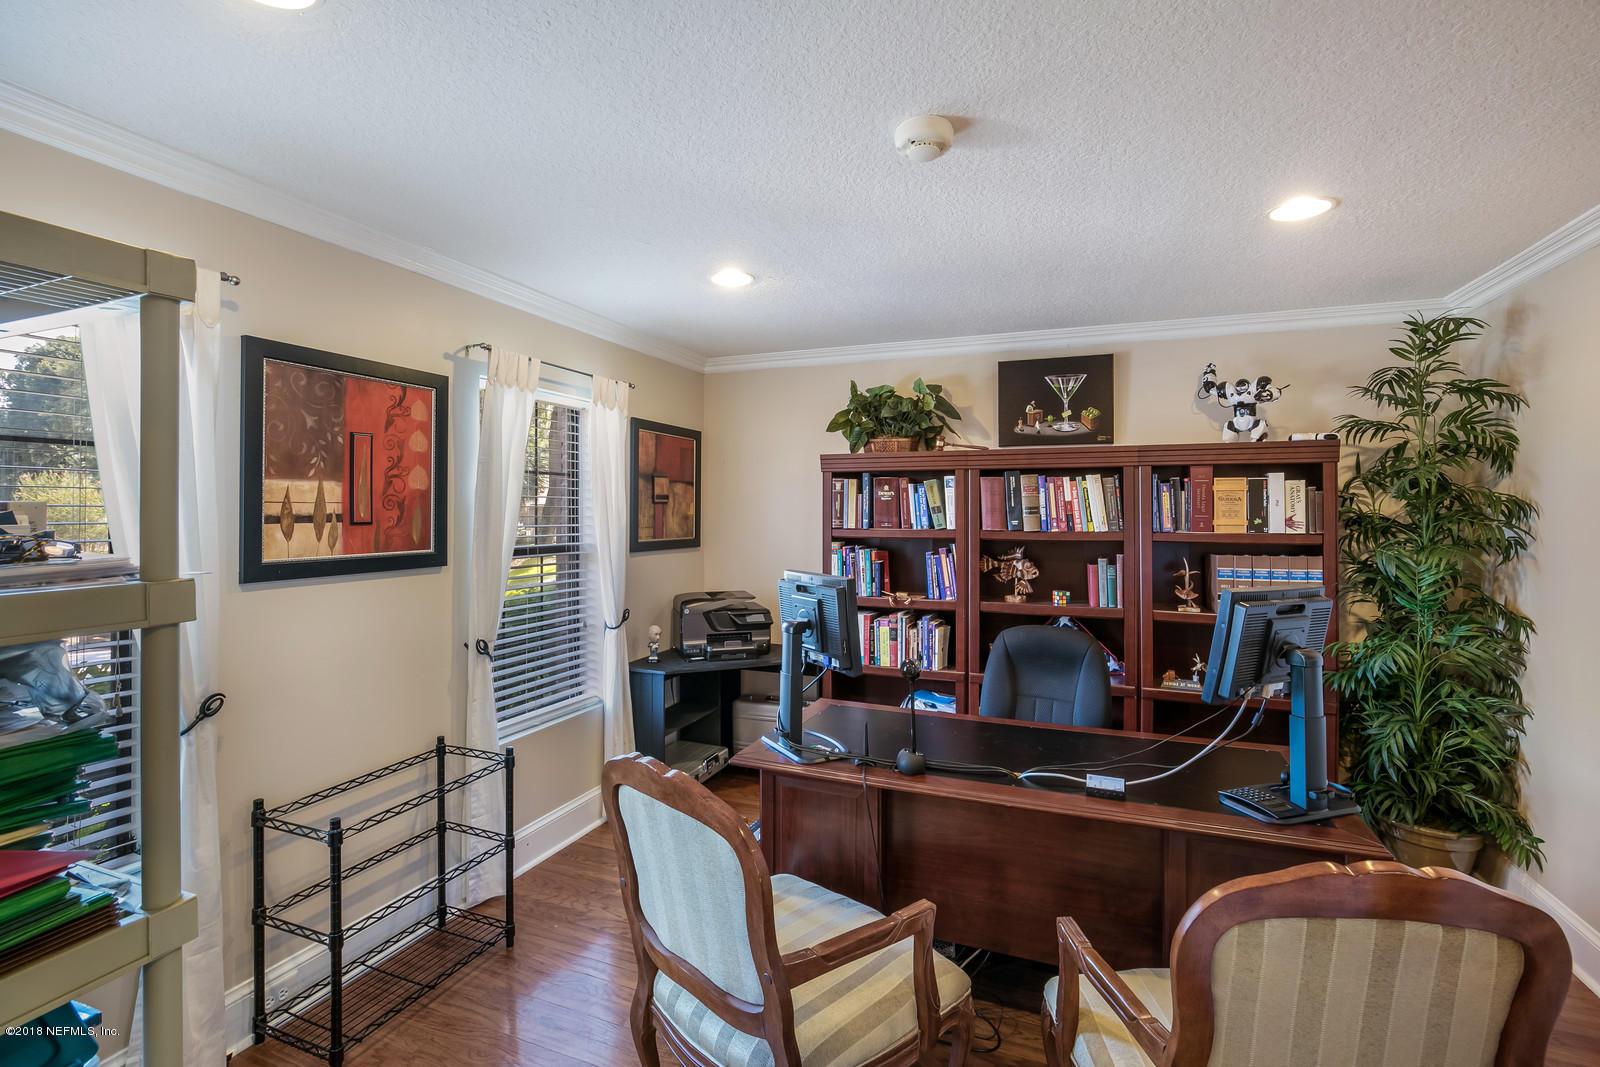 11718 ALEXANDER, JACKSONVILLE, FLORIDA 32225, 5 Bedrooms Bedrooms, ,4 BathroomsBathrooms,Residential - single family,For sale,ALEXANDER,952356